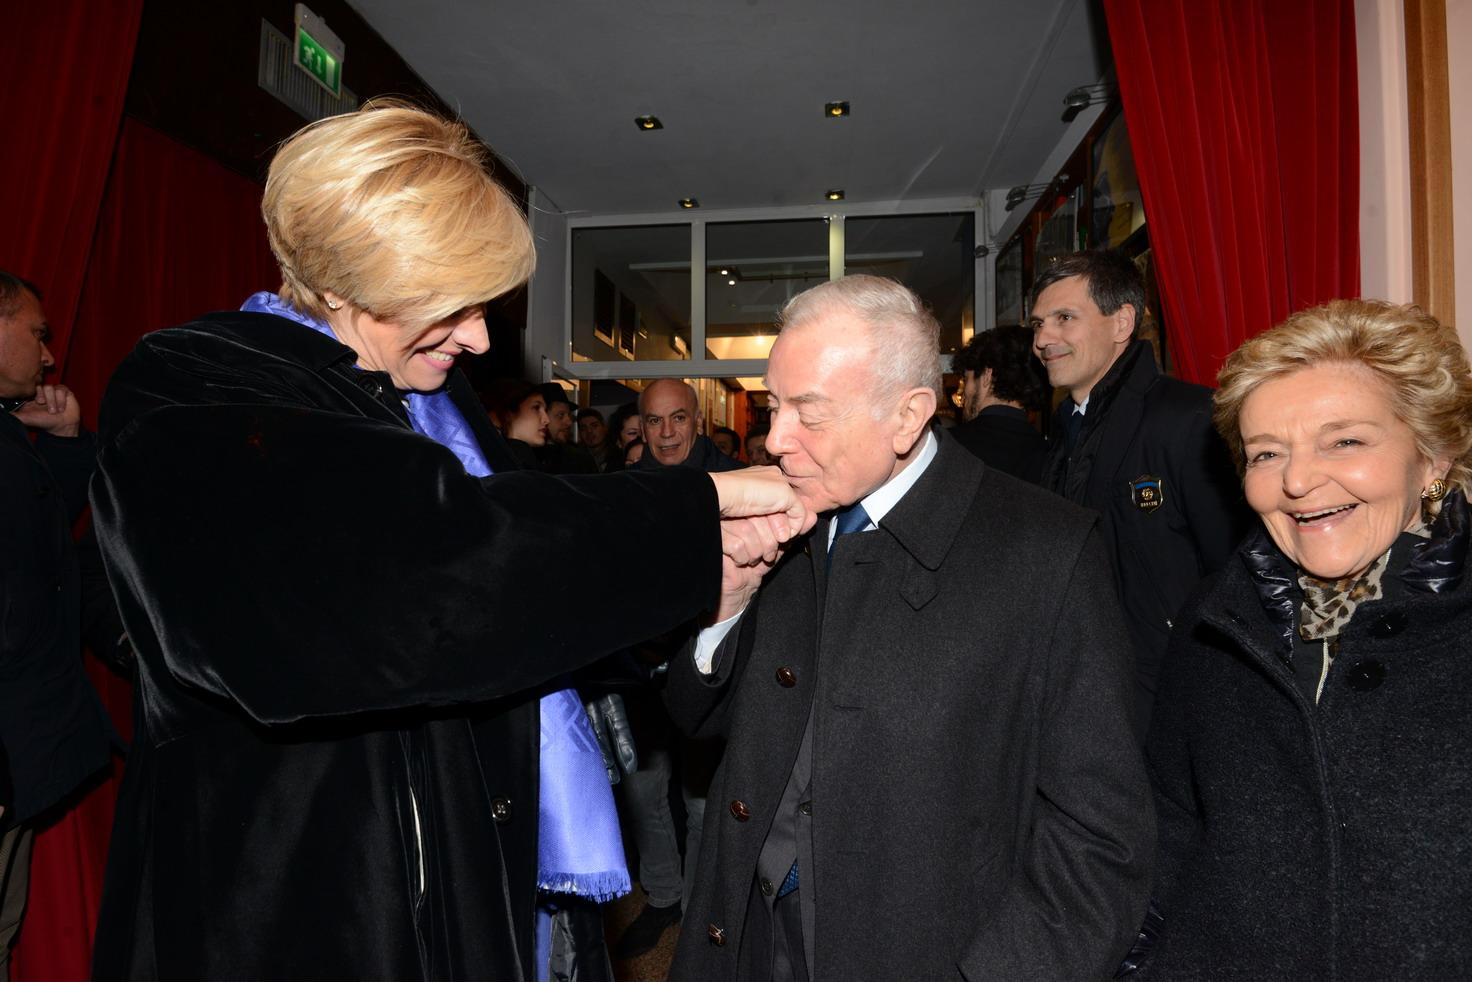 Roberta Pinotti, Gianni Letta